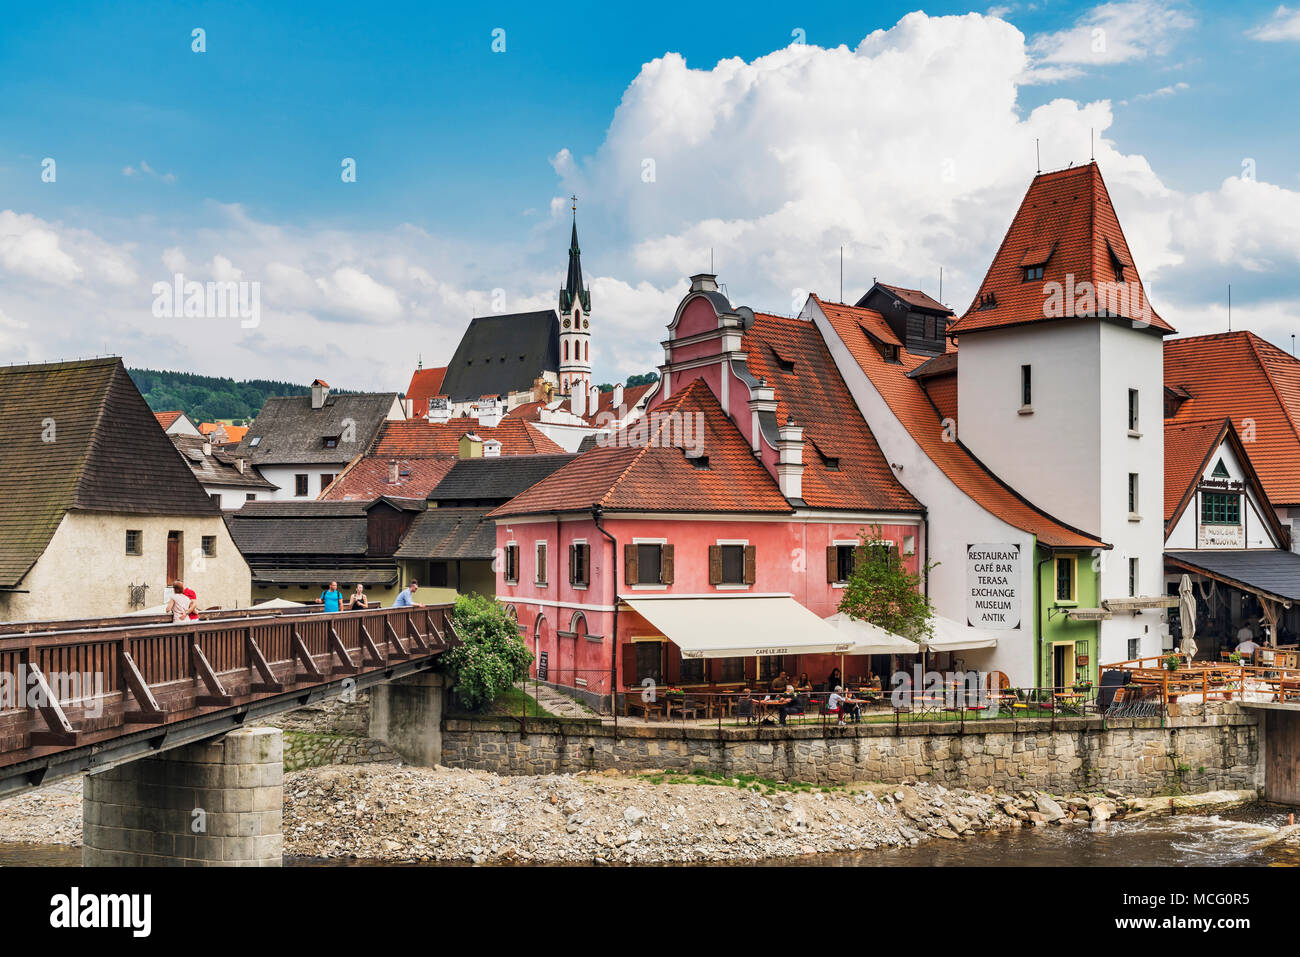 The Krumlov mill is located in the old town of Cesky Krumlov on the Vltava River, Bohemia, Jihocesky Kraj, Czech Republic, Europe - Stock Image